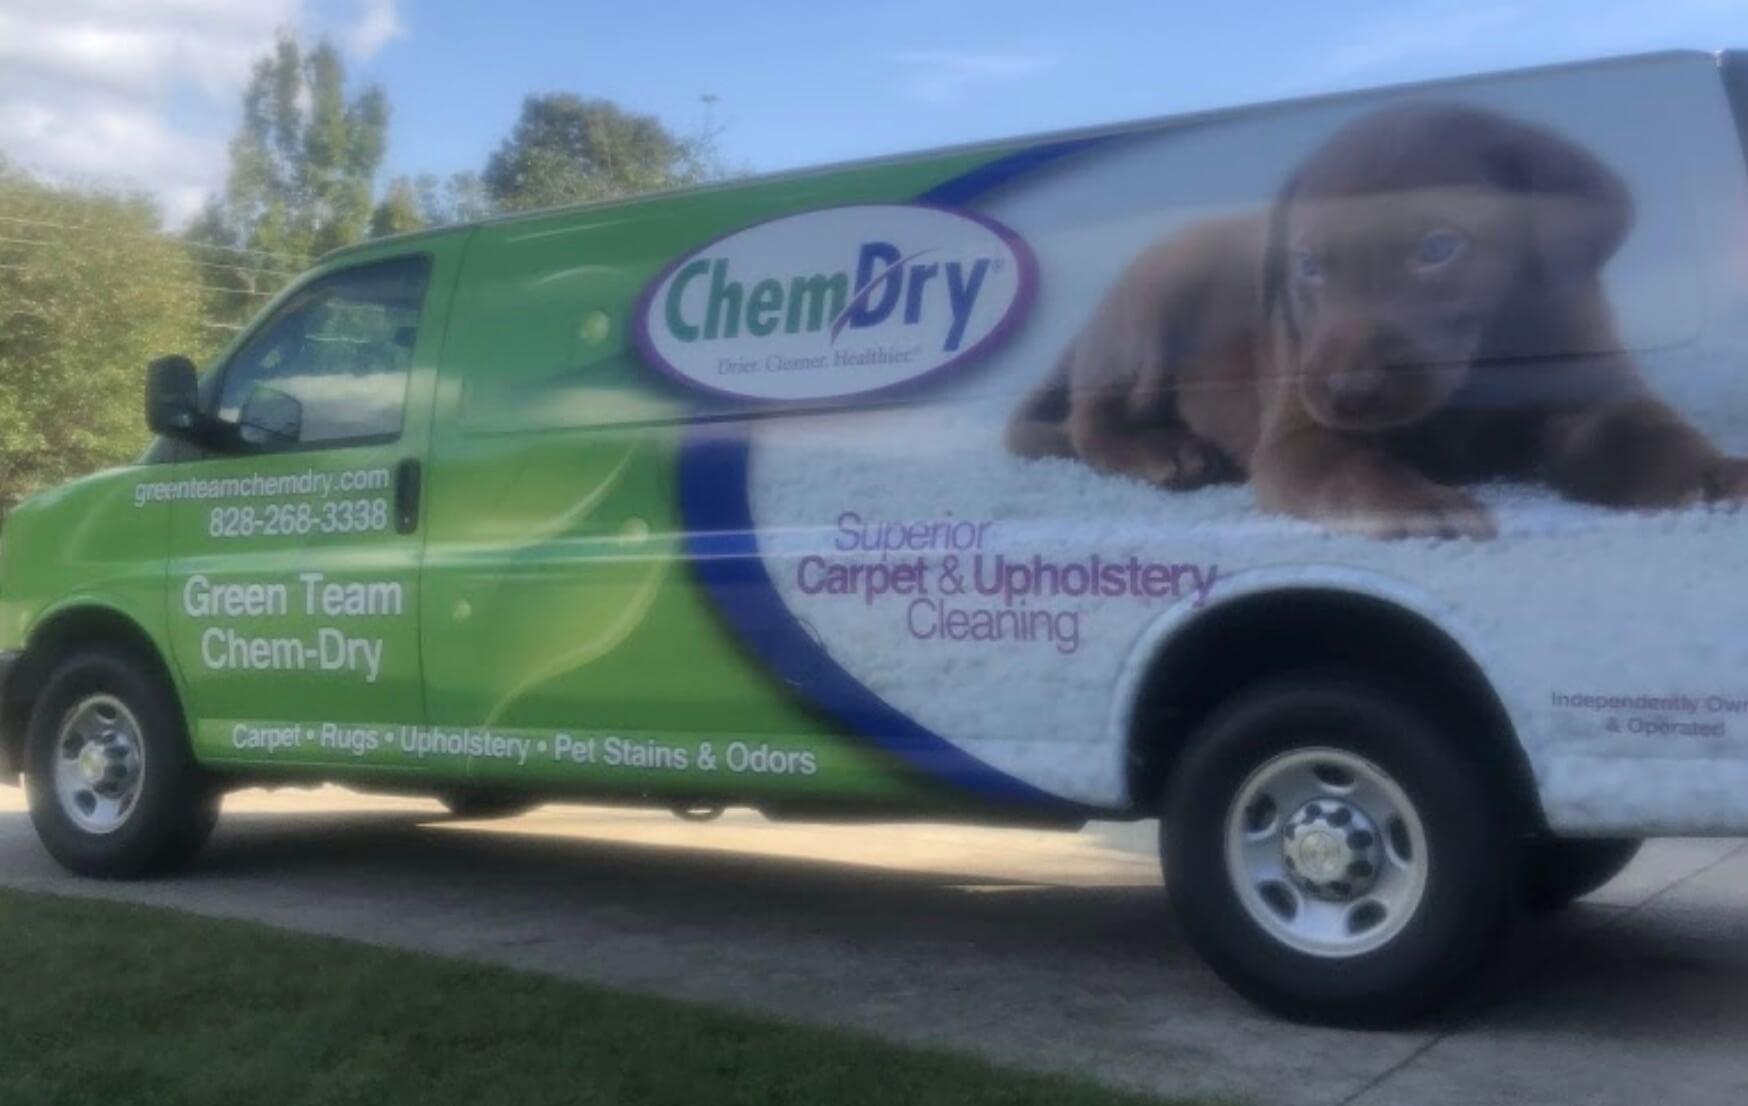 green team chem-dry van